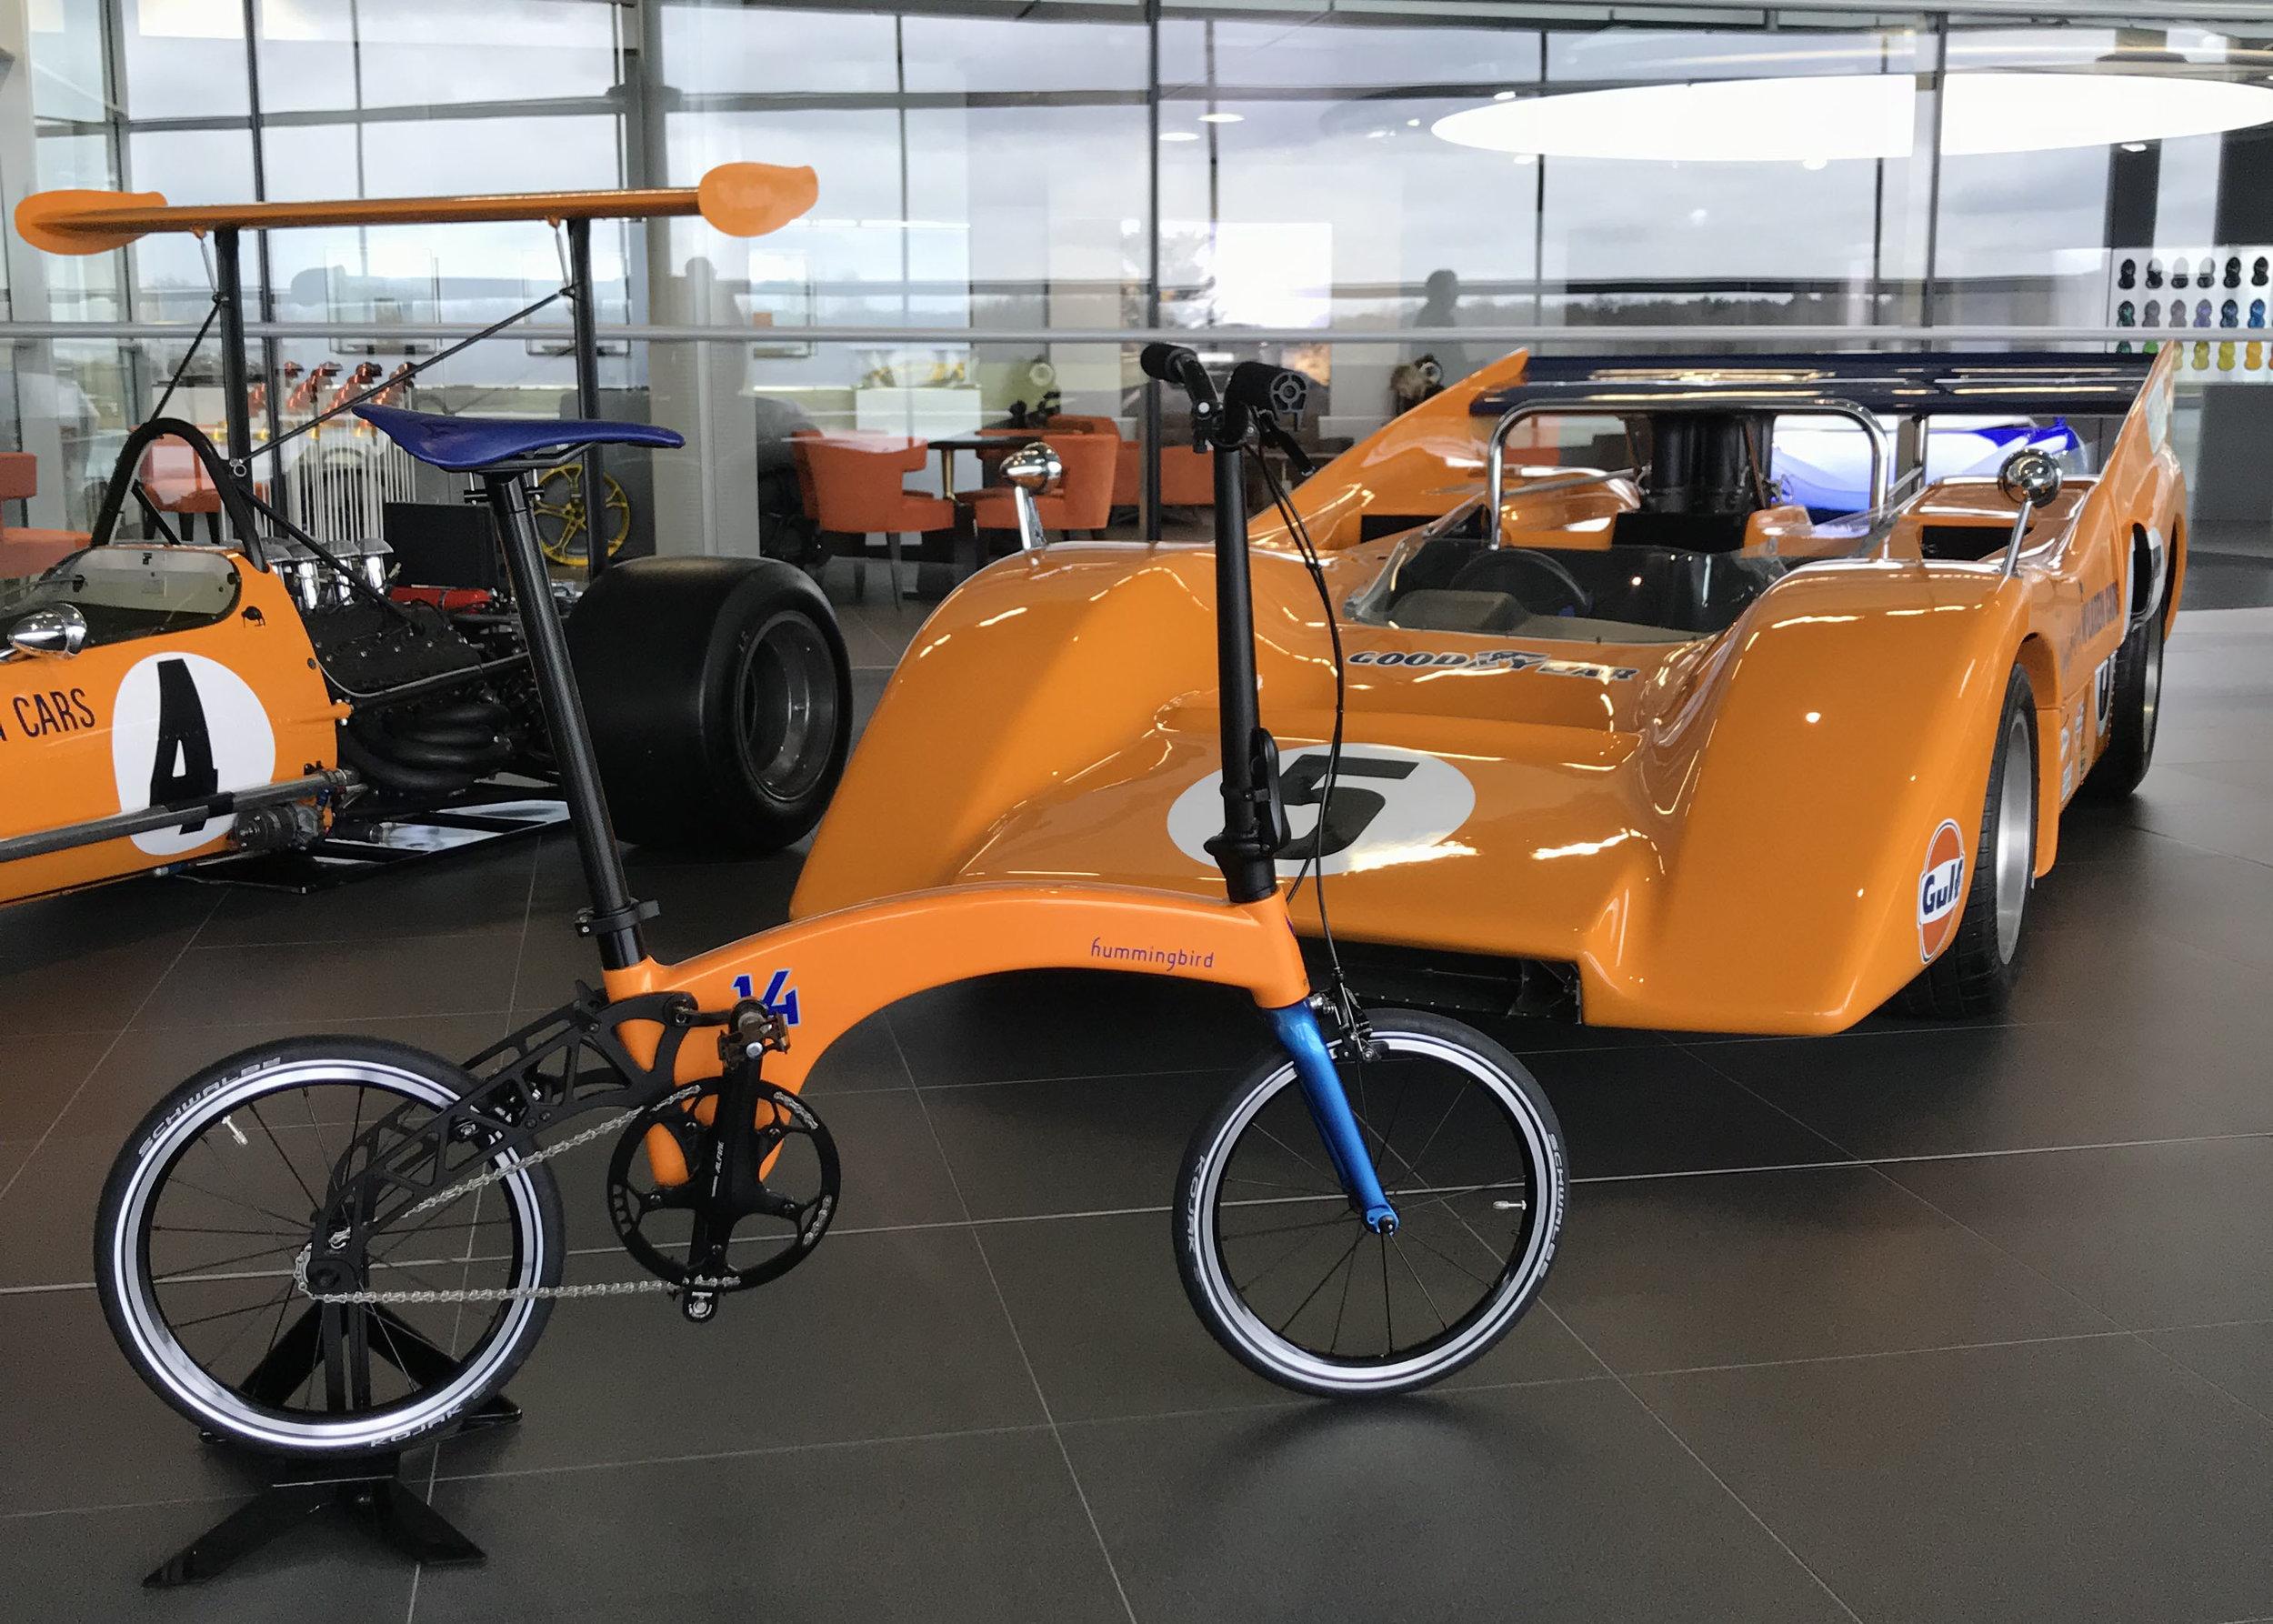 Bespoke Hummingbird for Fernando Alonso in McLaren's iconic orange paint.